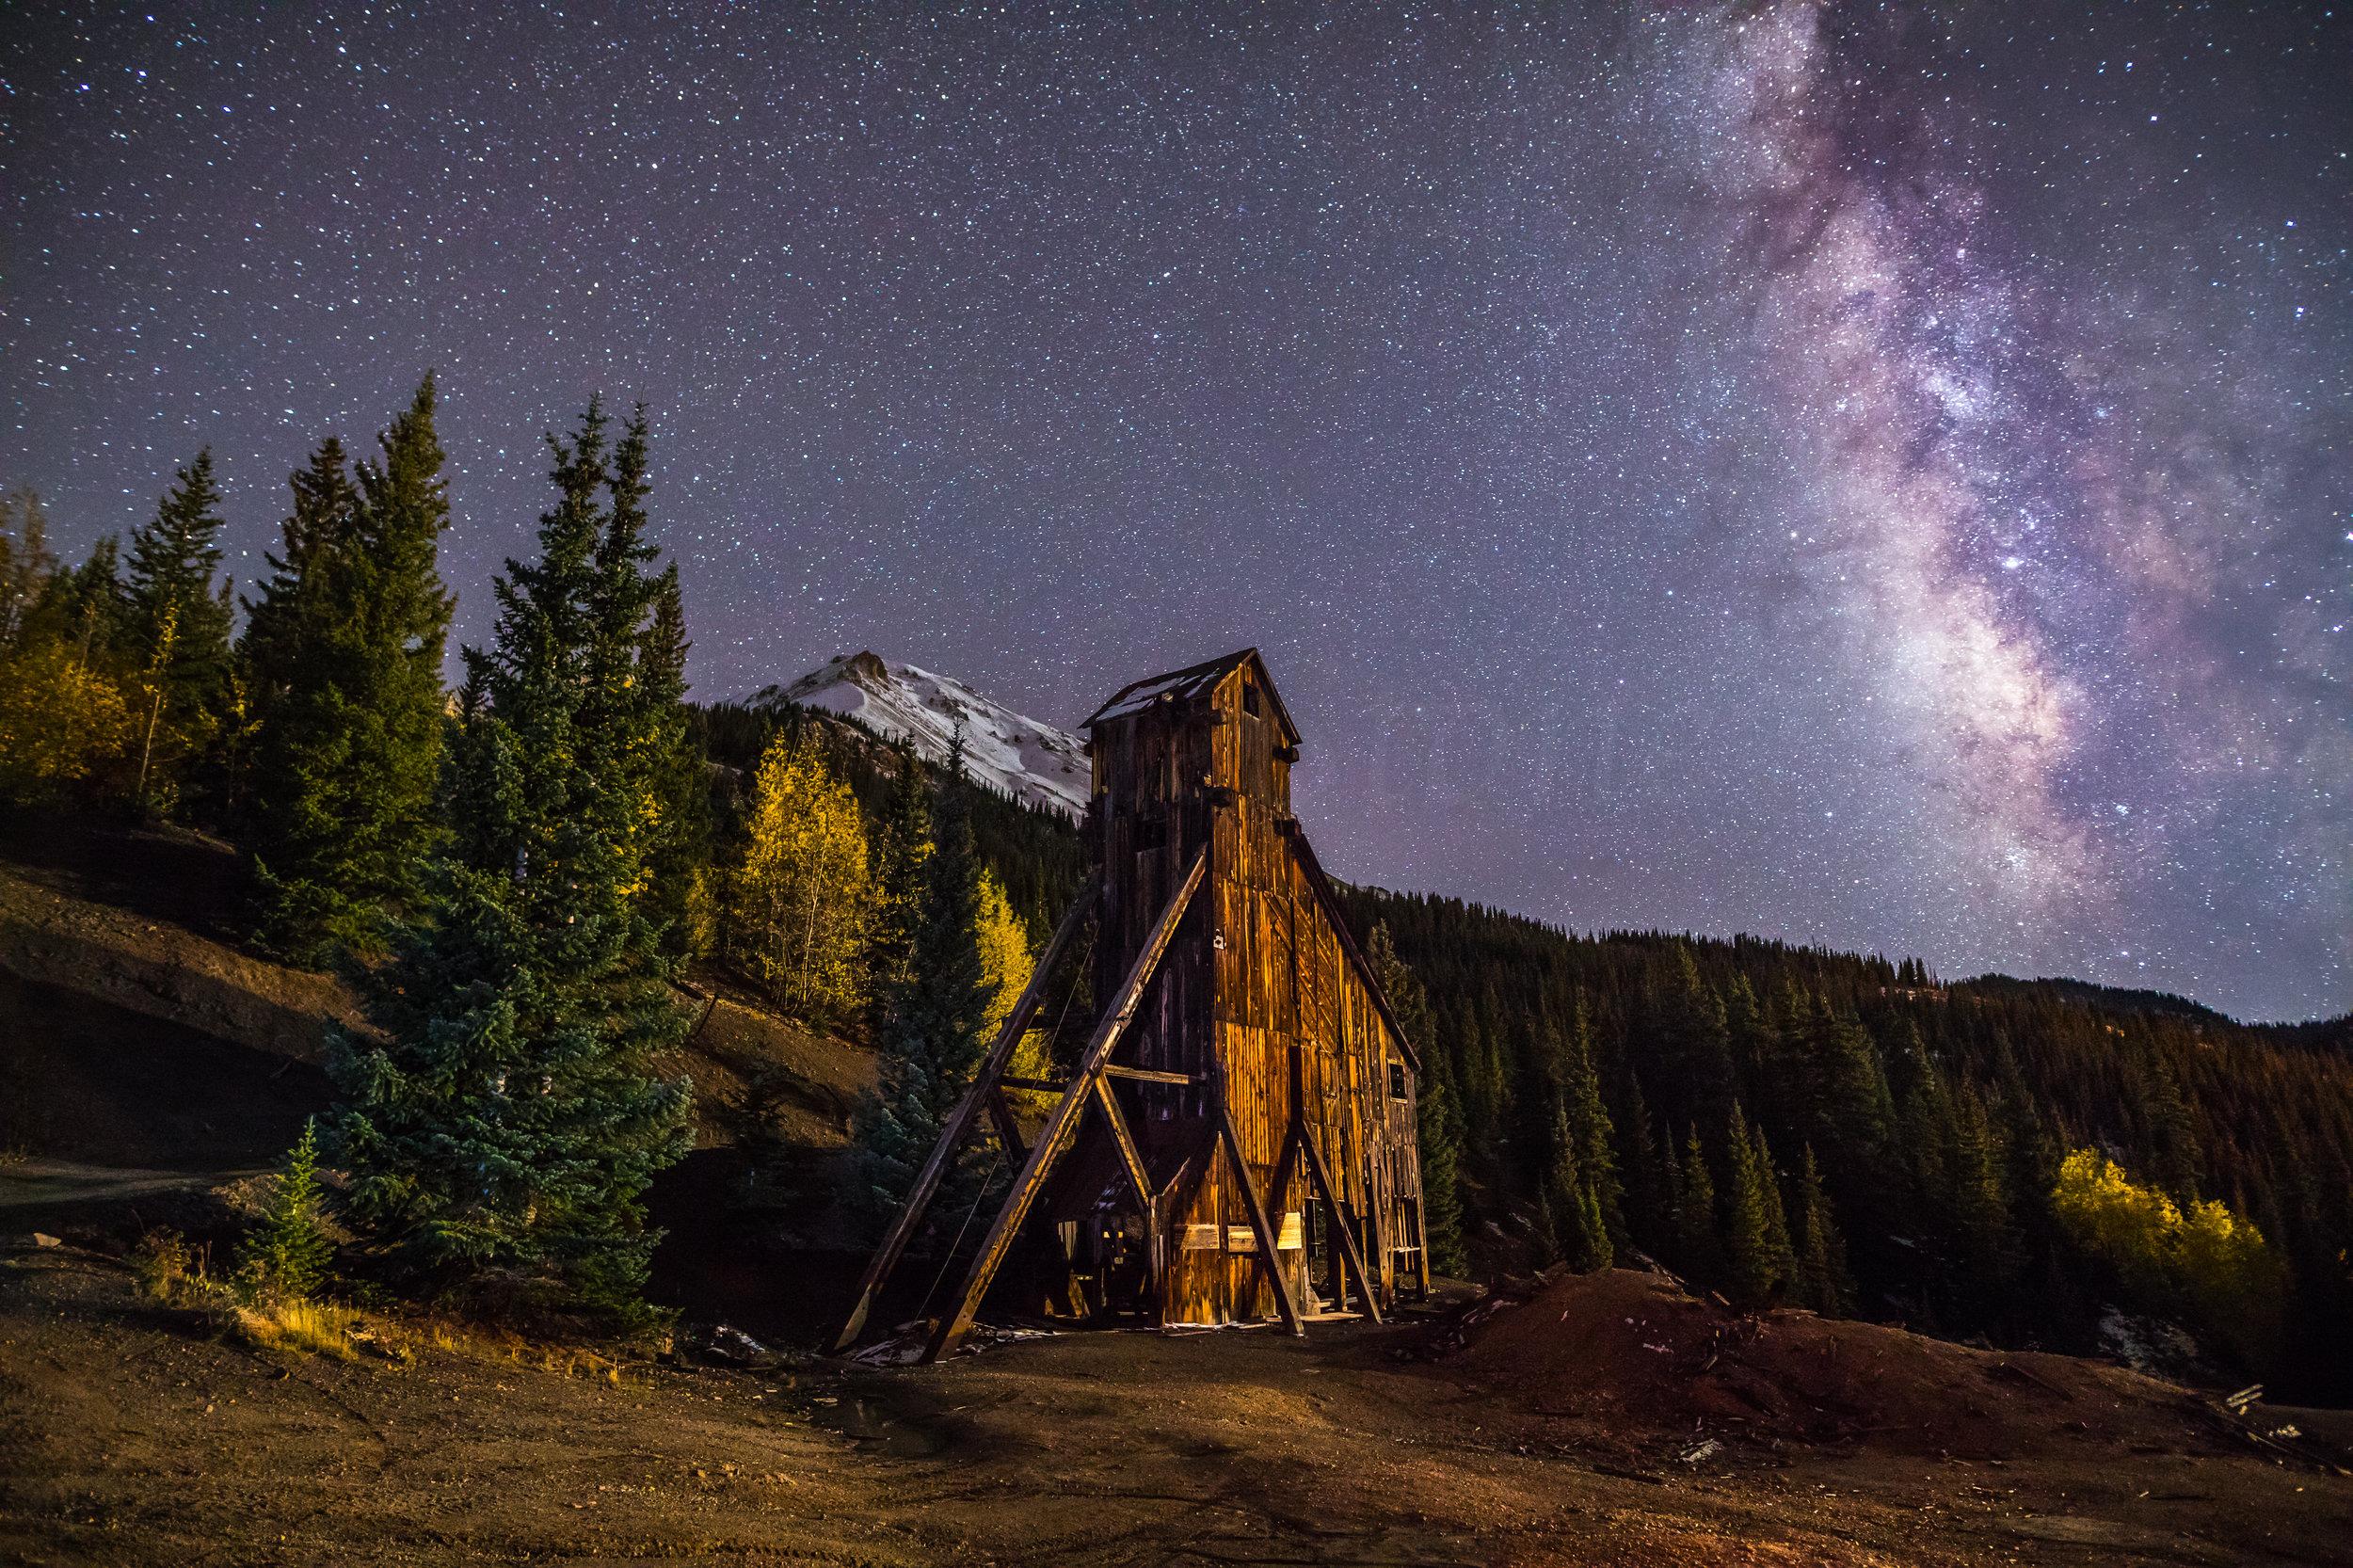 Milky way over Yankee Girl Mine, Image # 5463